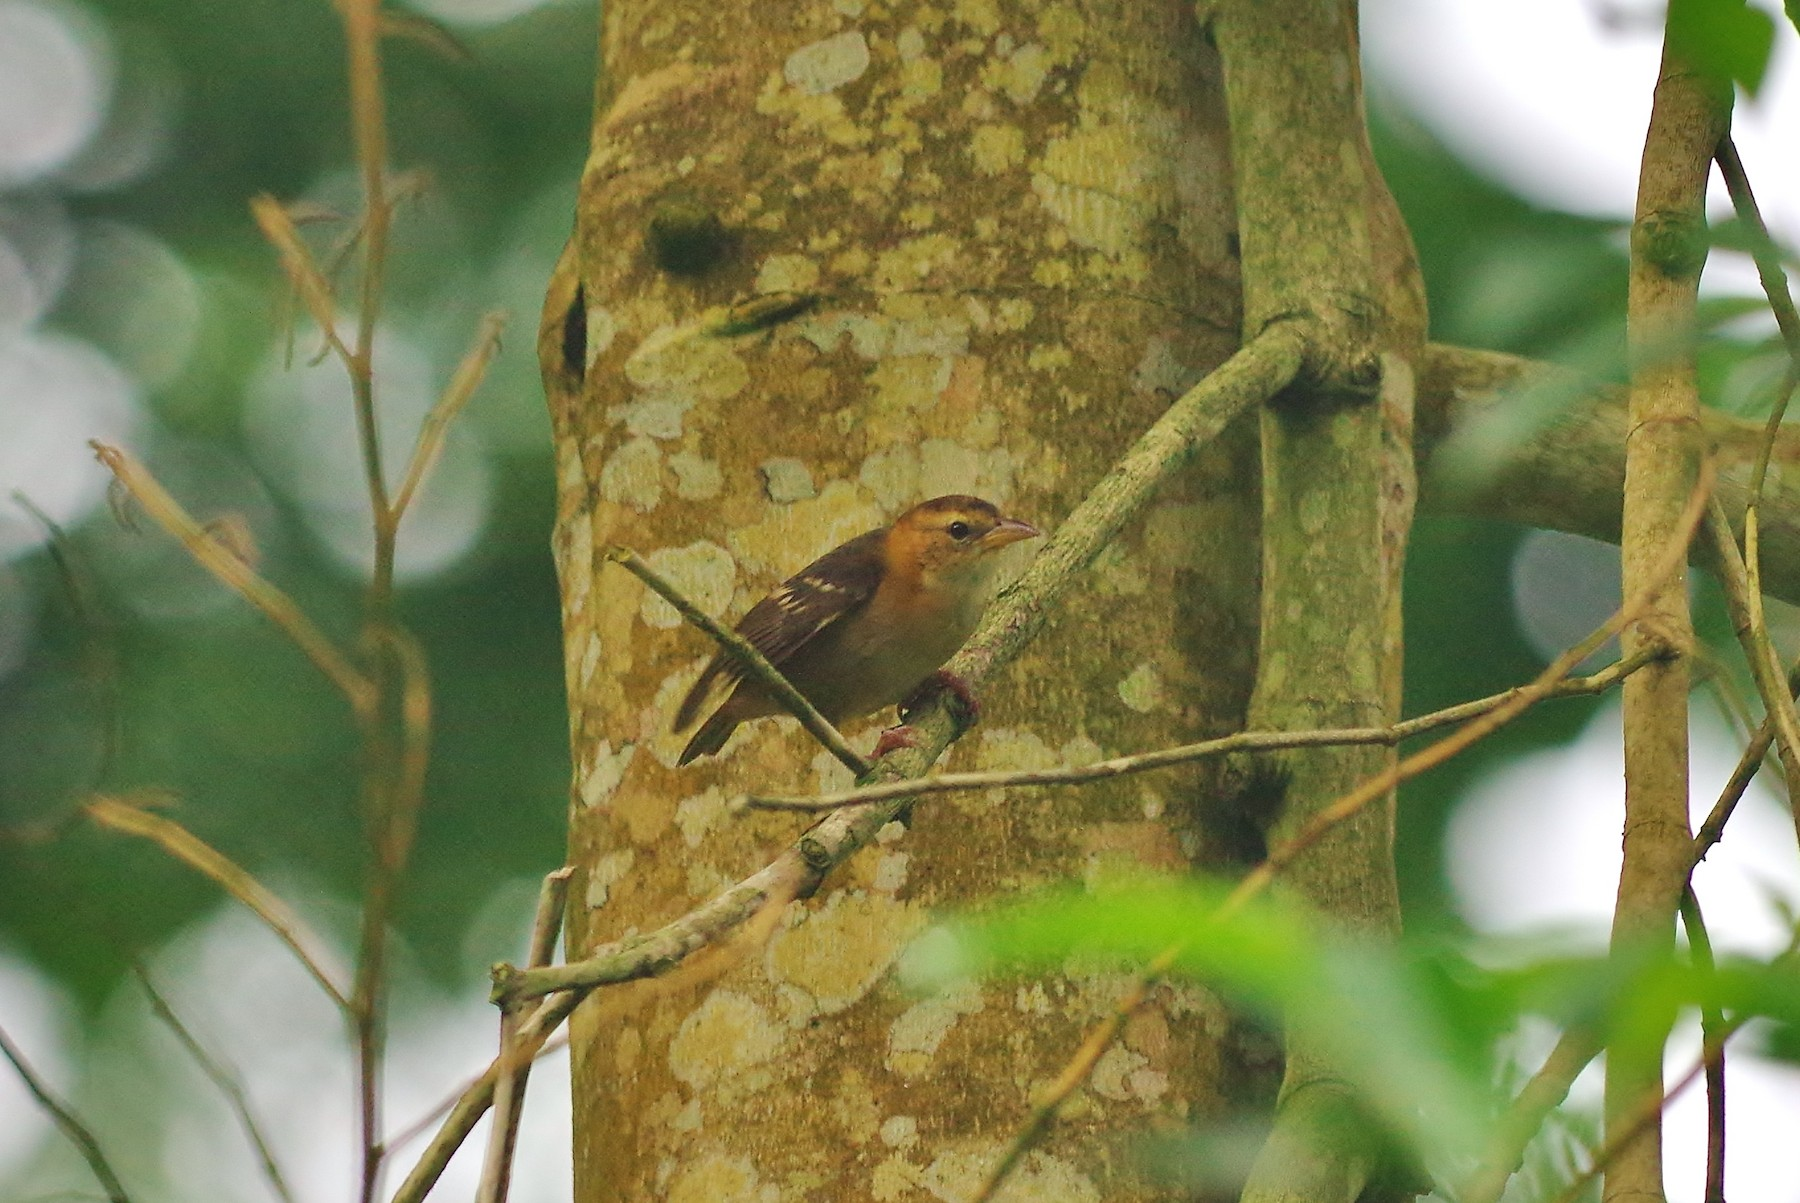 Sao Tome Weaver - Thibaud Aronson